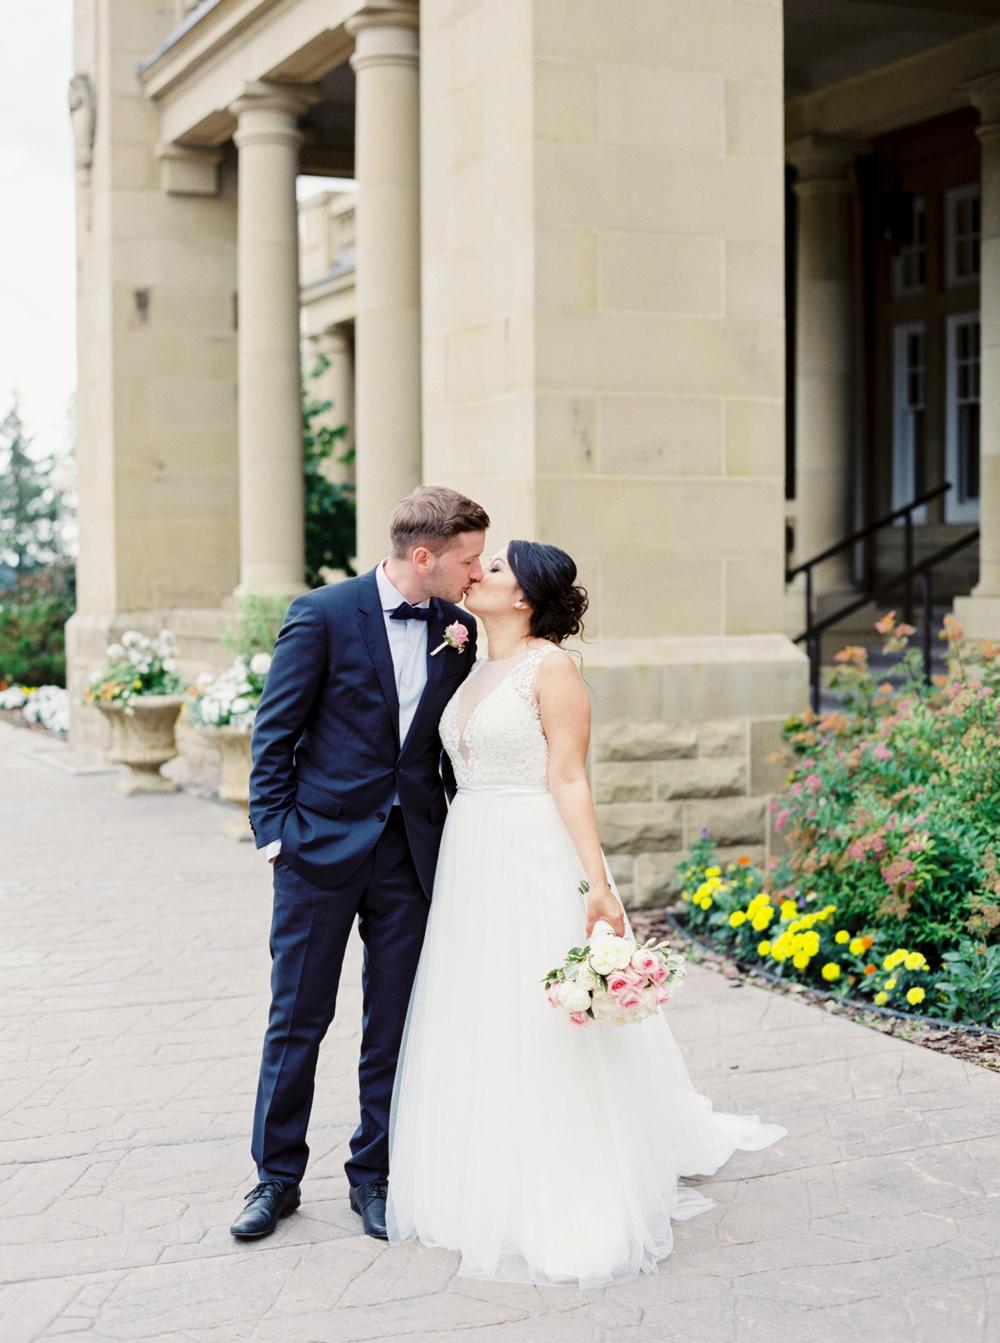 Calgary Wedding Photographers | Edmonton Vietnamese German Wedding | Watters wedding dress & multi colored asian dresses